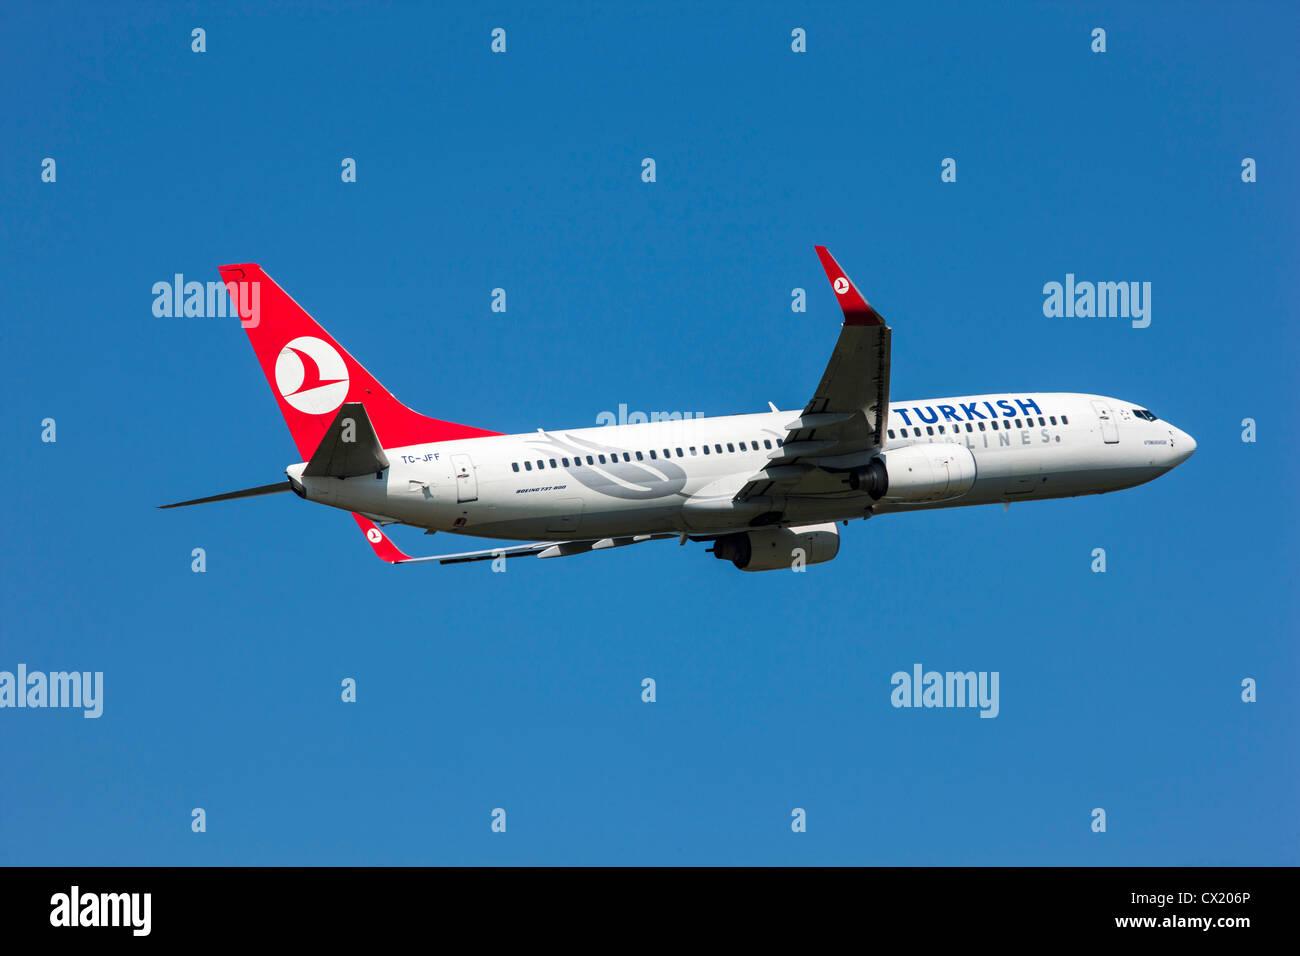 Passenger jet plane taking off form Düsseldorf International Airport. Turkish Airlines, Boeing 737-800, - Stock Image